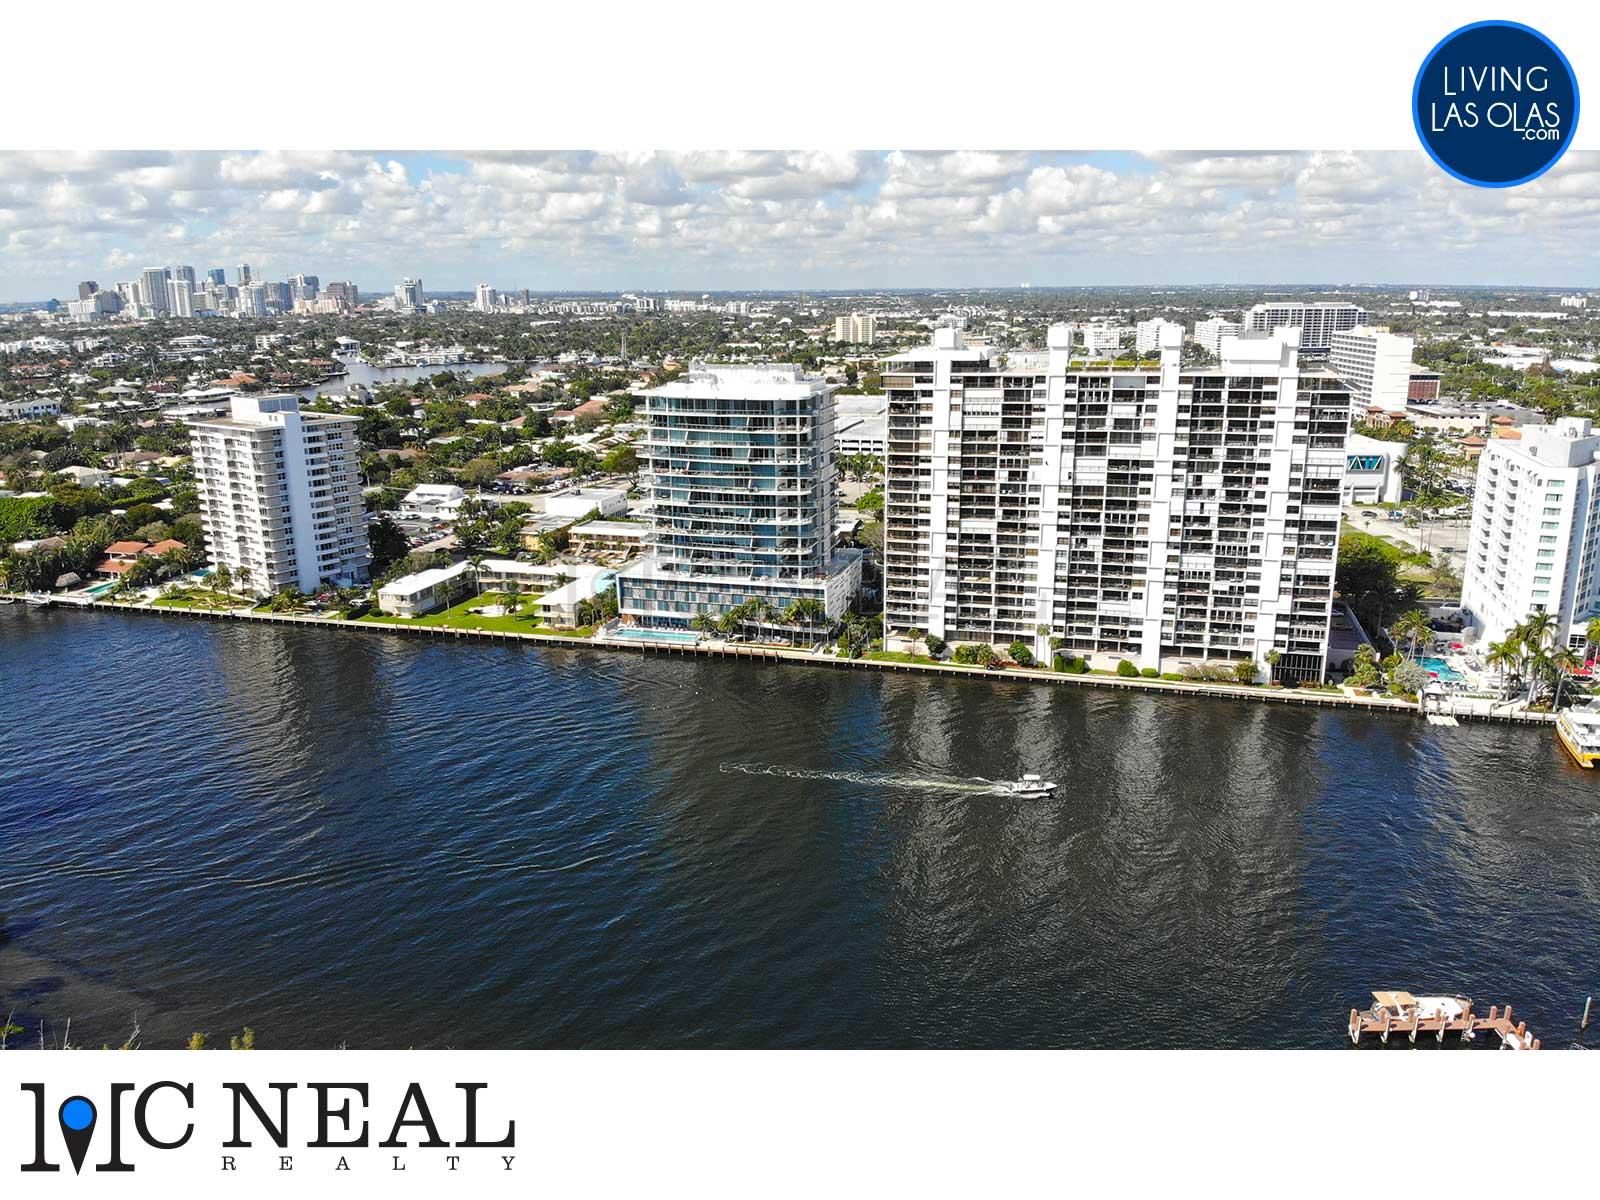 Sunrise Neighborhood Fort Lauderdale Homes Real Estate 05